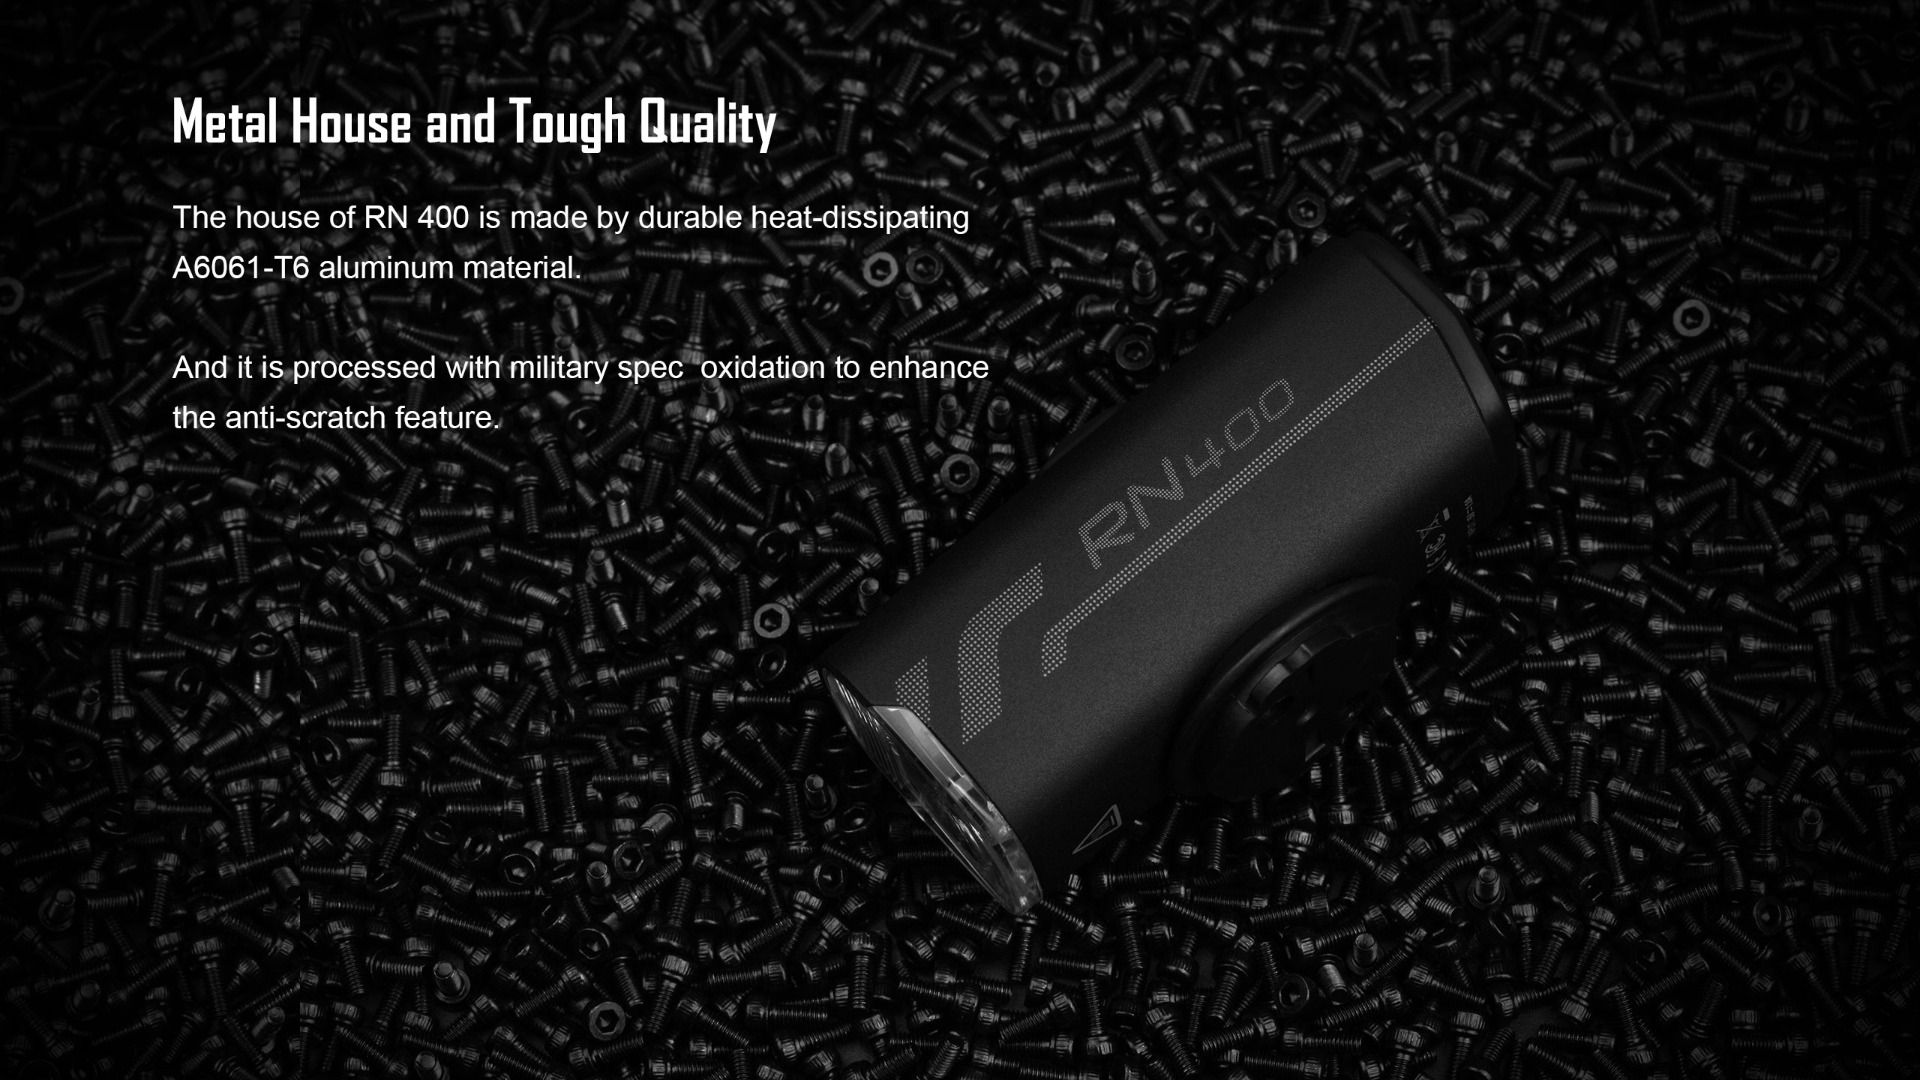 Olight RN 400 Bike LED Light Headlight Adapter Quickly